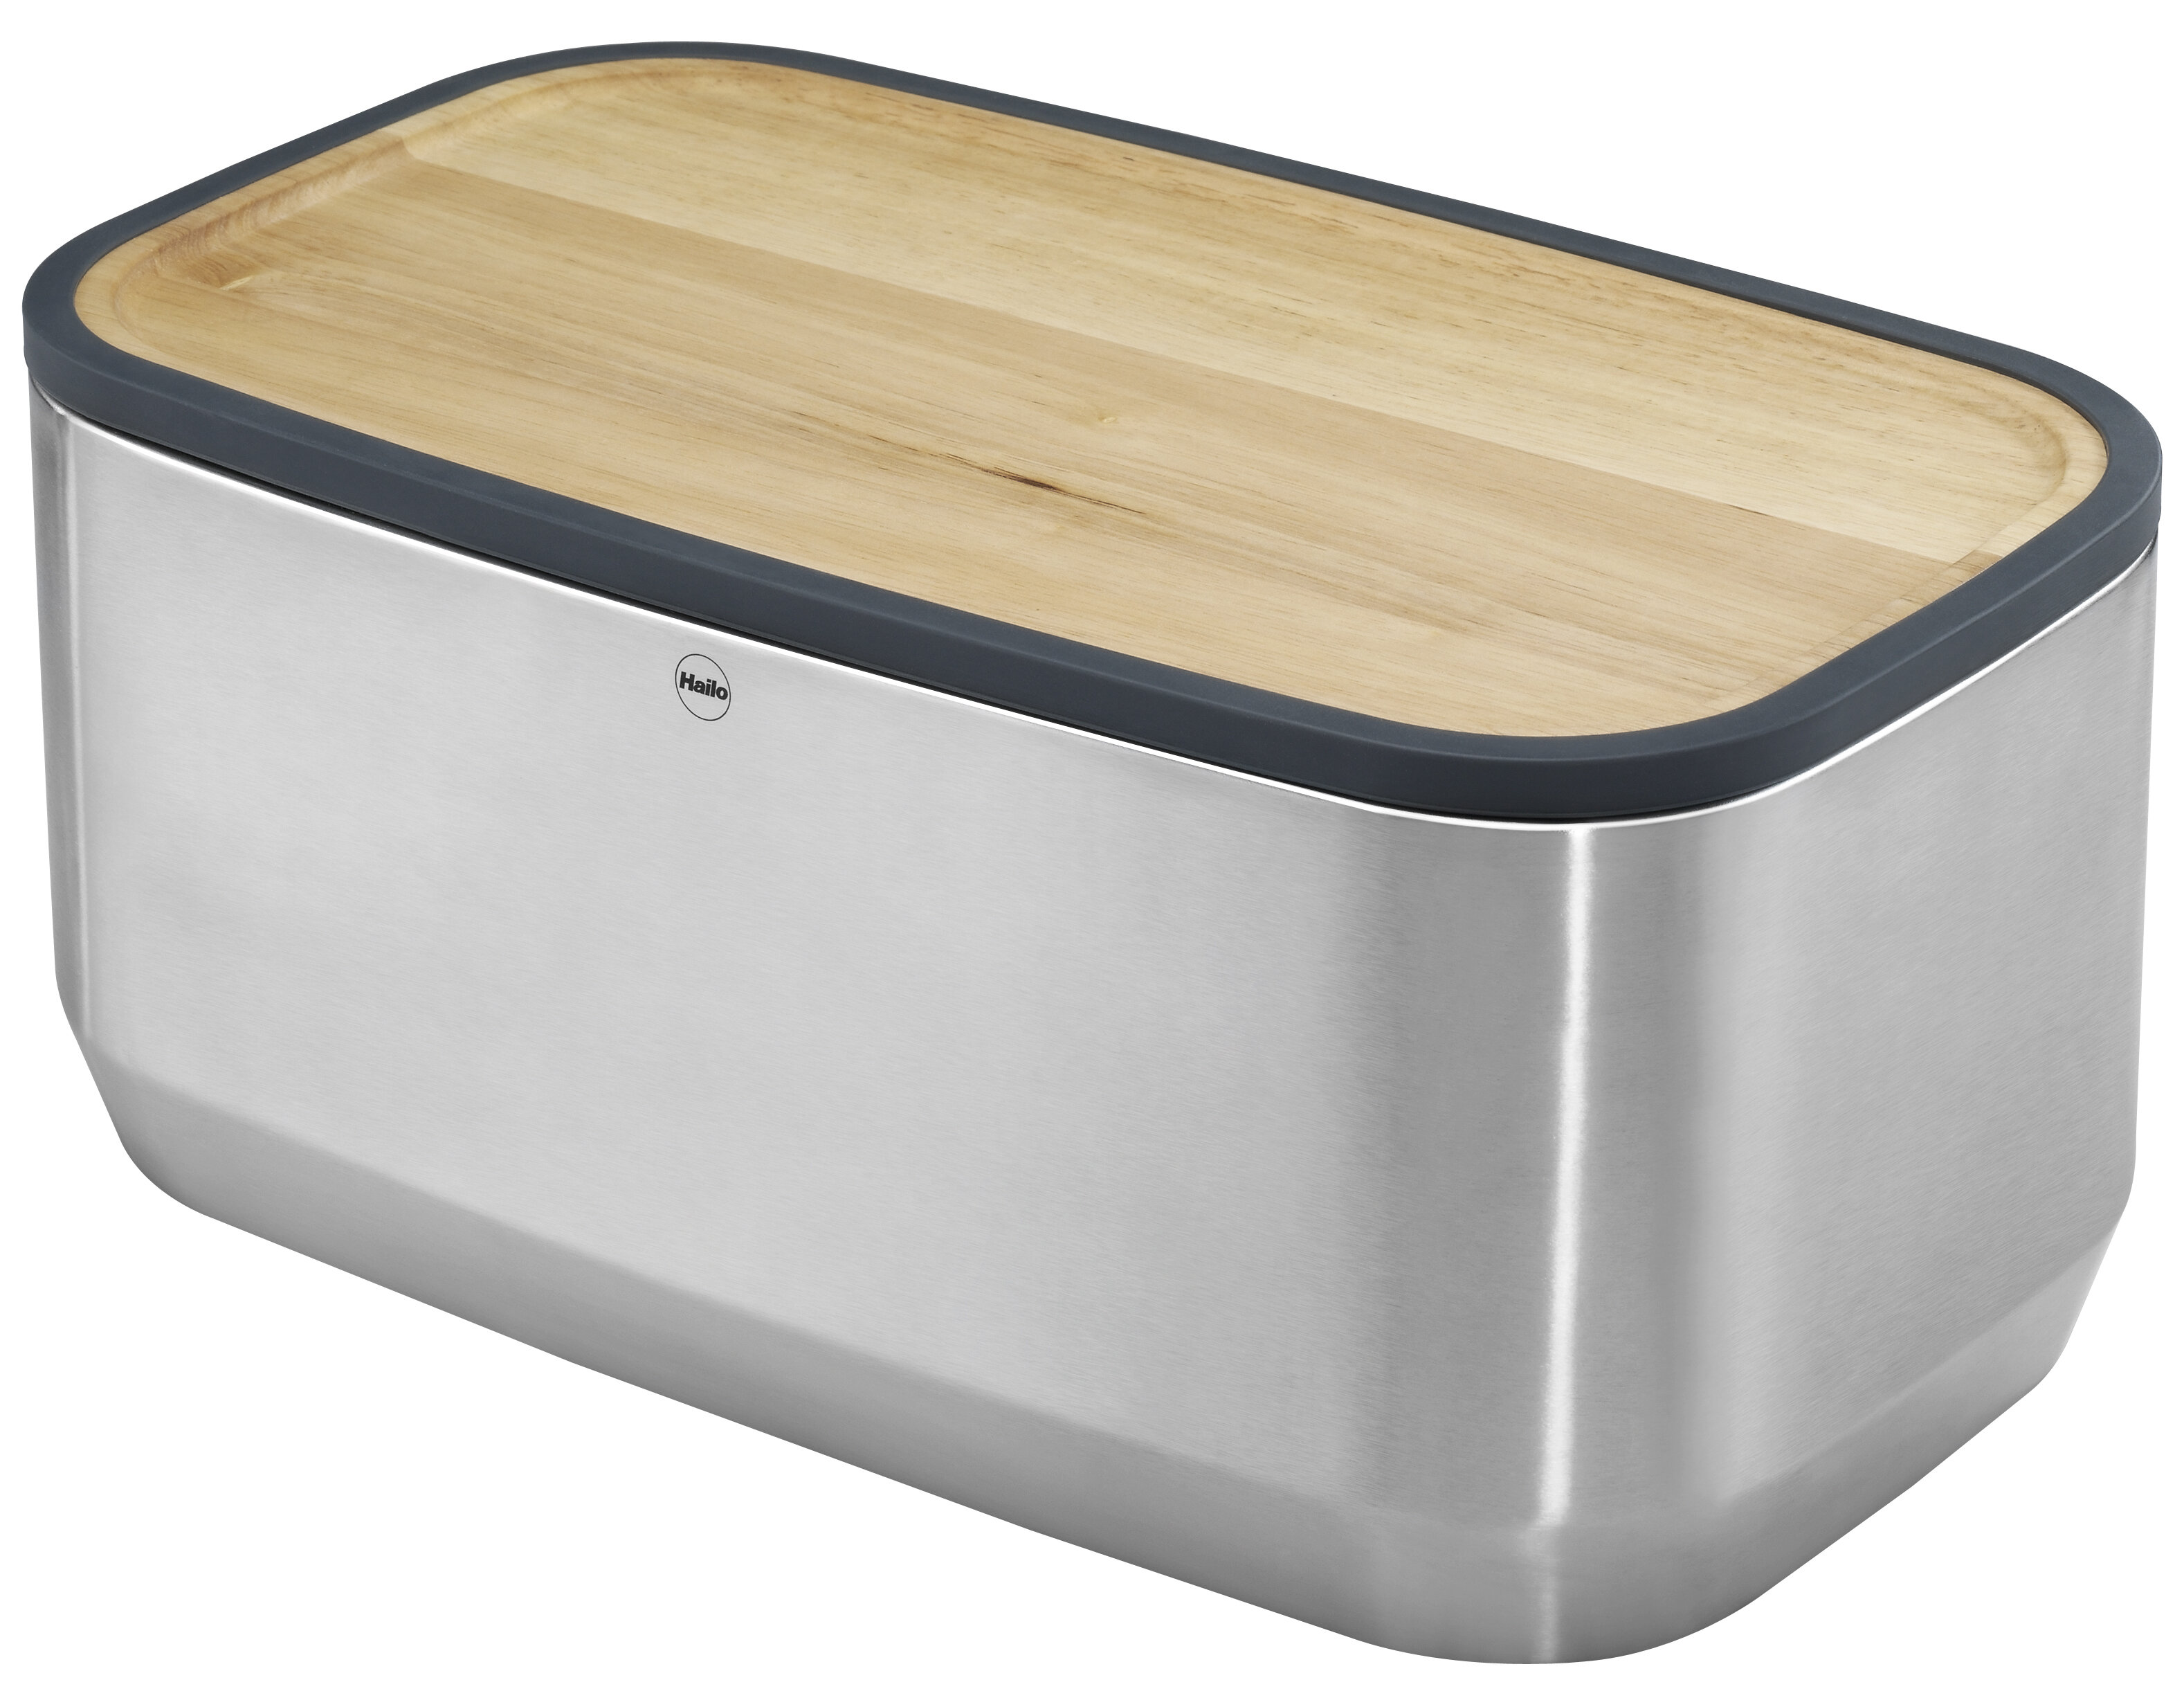 Hailo USA Inc Bread Box Wayfair